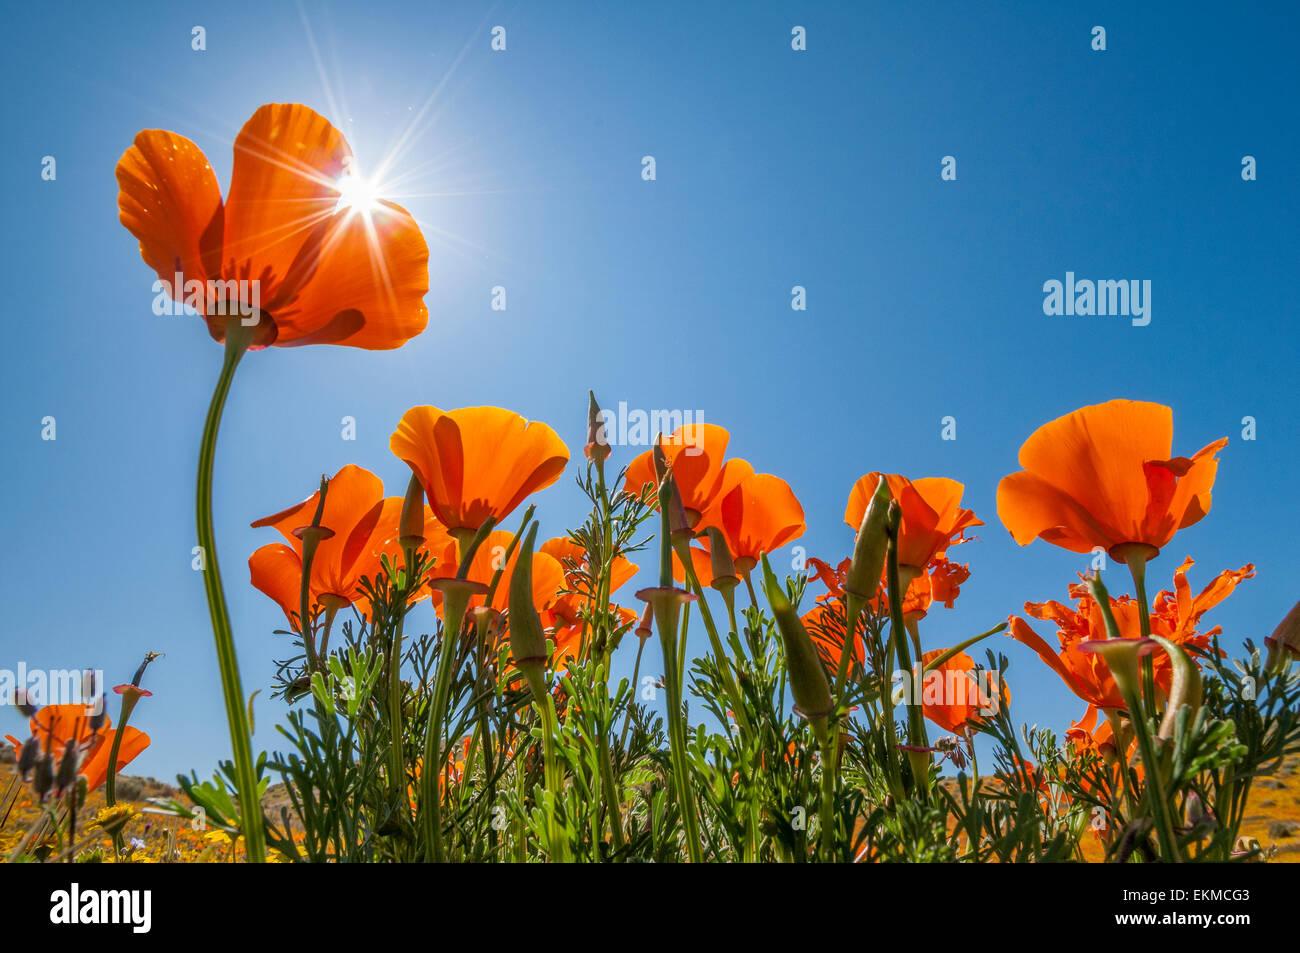 California Poppies in bloom, Antelope Valley California Poppy Reserve, Mojave Desert, California. - Stock Image